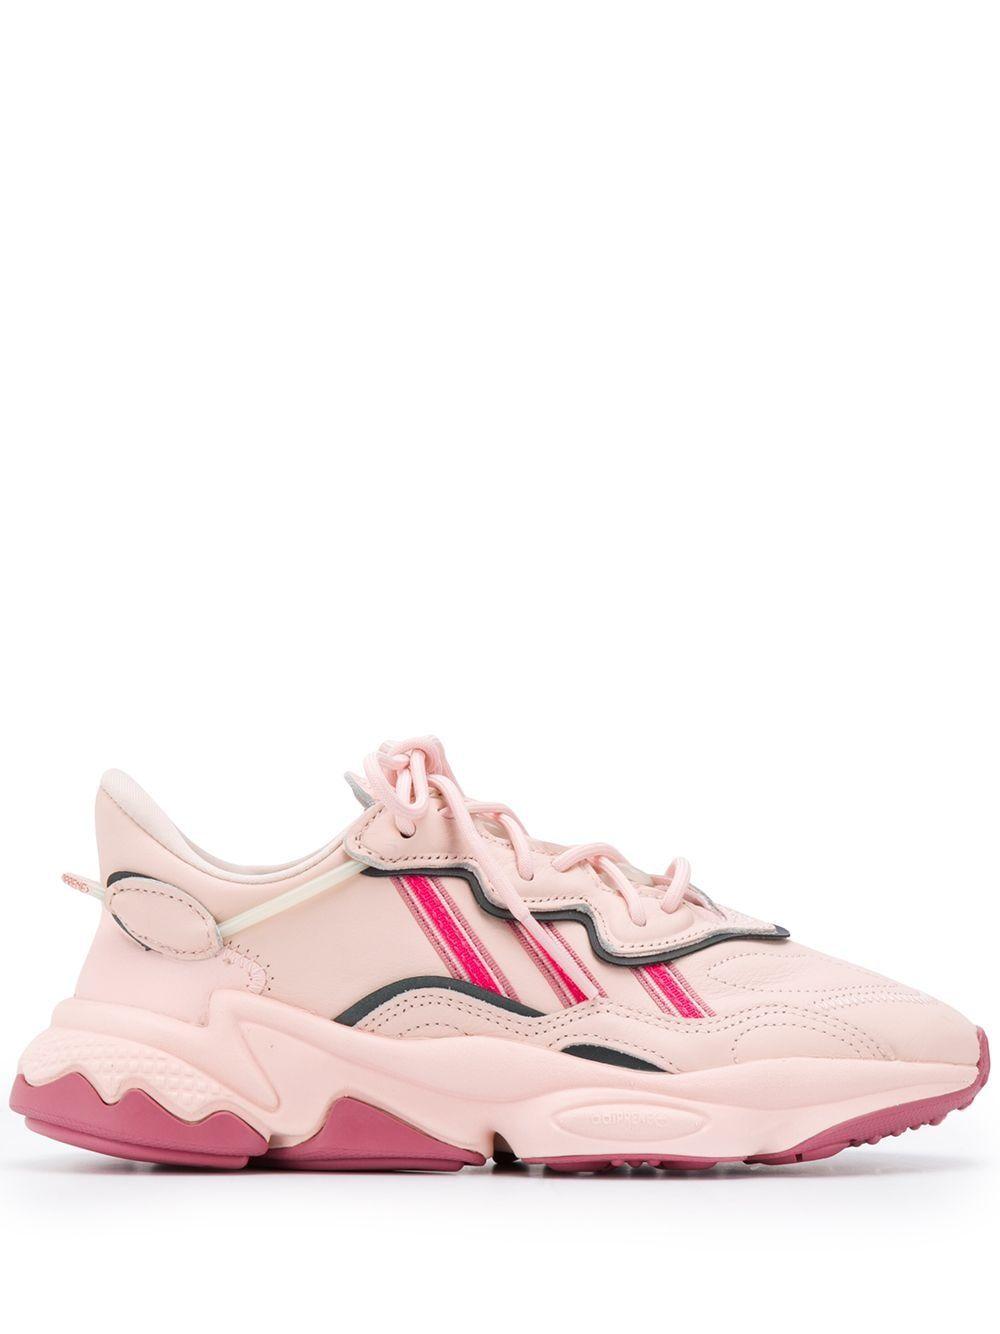 Adidas Ozweego Low Top Sneakers Farfetch Sneakers Top Sneakers Adidas